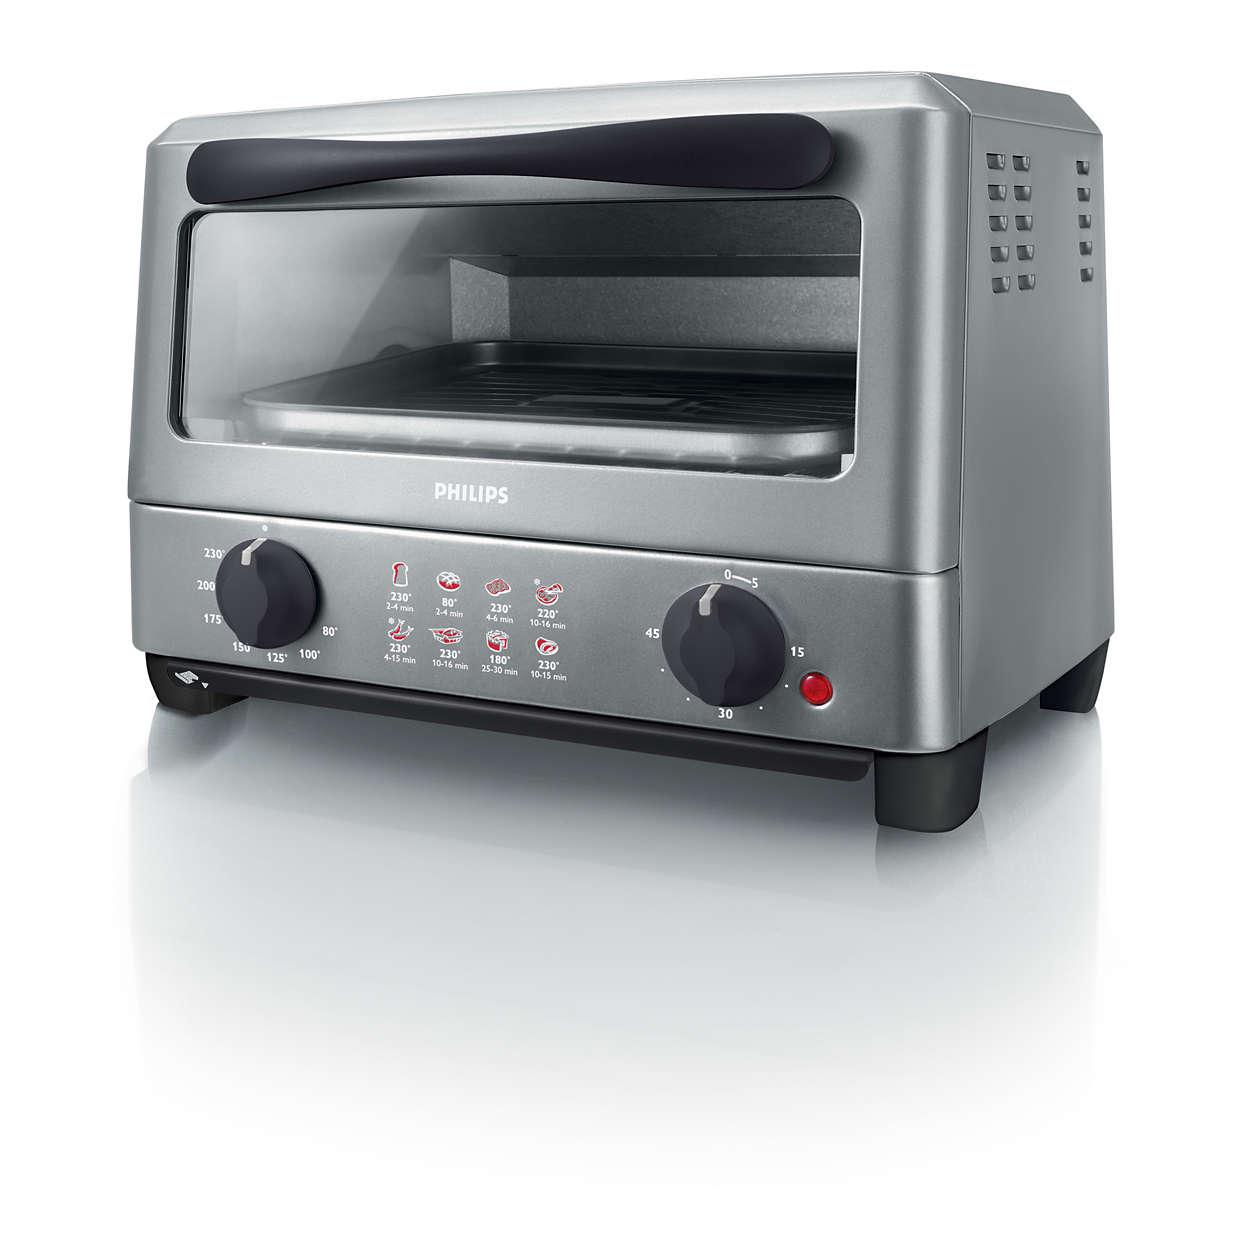 Pratos quentes e deliciosos com total facilidade